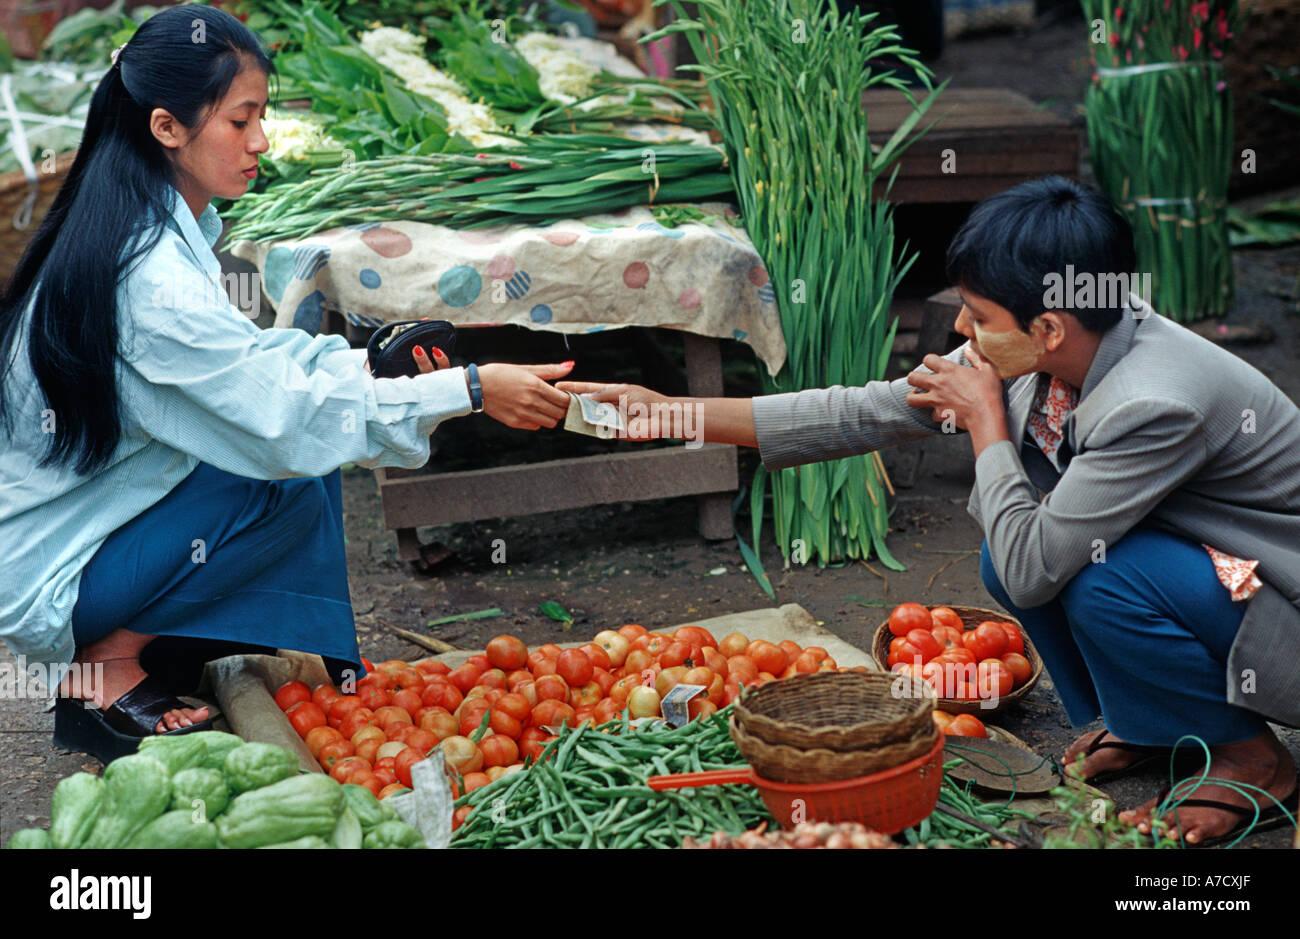 A market transaction Money changes hands Fruit vegetable vendor with face powder maiing a sale Market Pyin U Lwin Maymyo BURMA - Stock Image